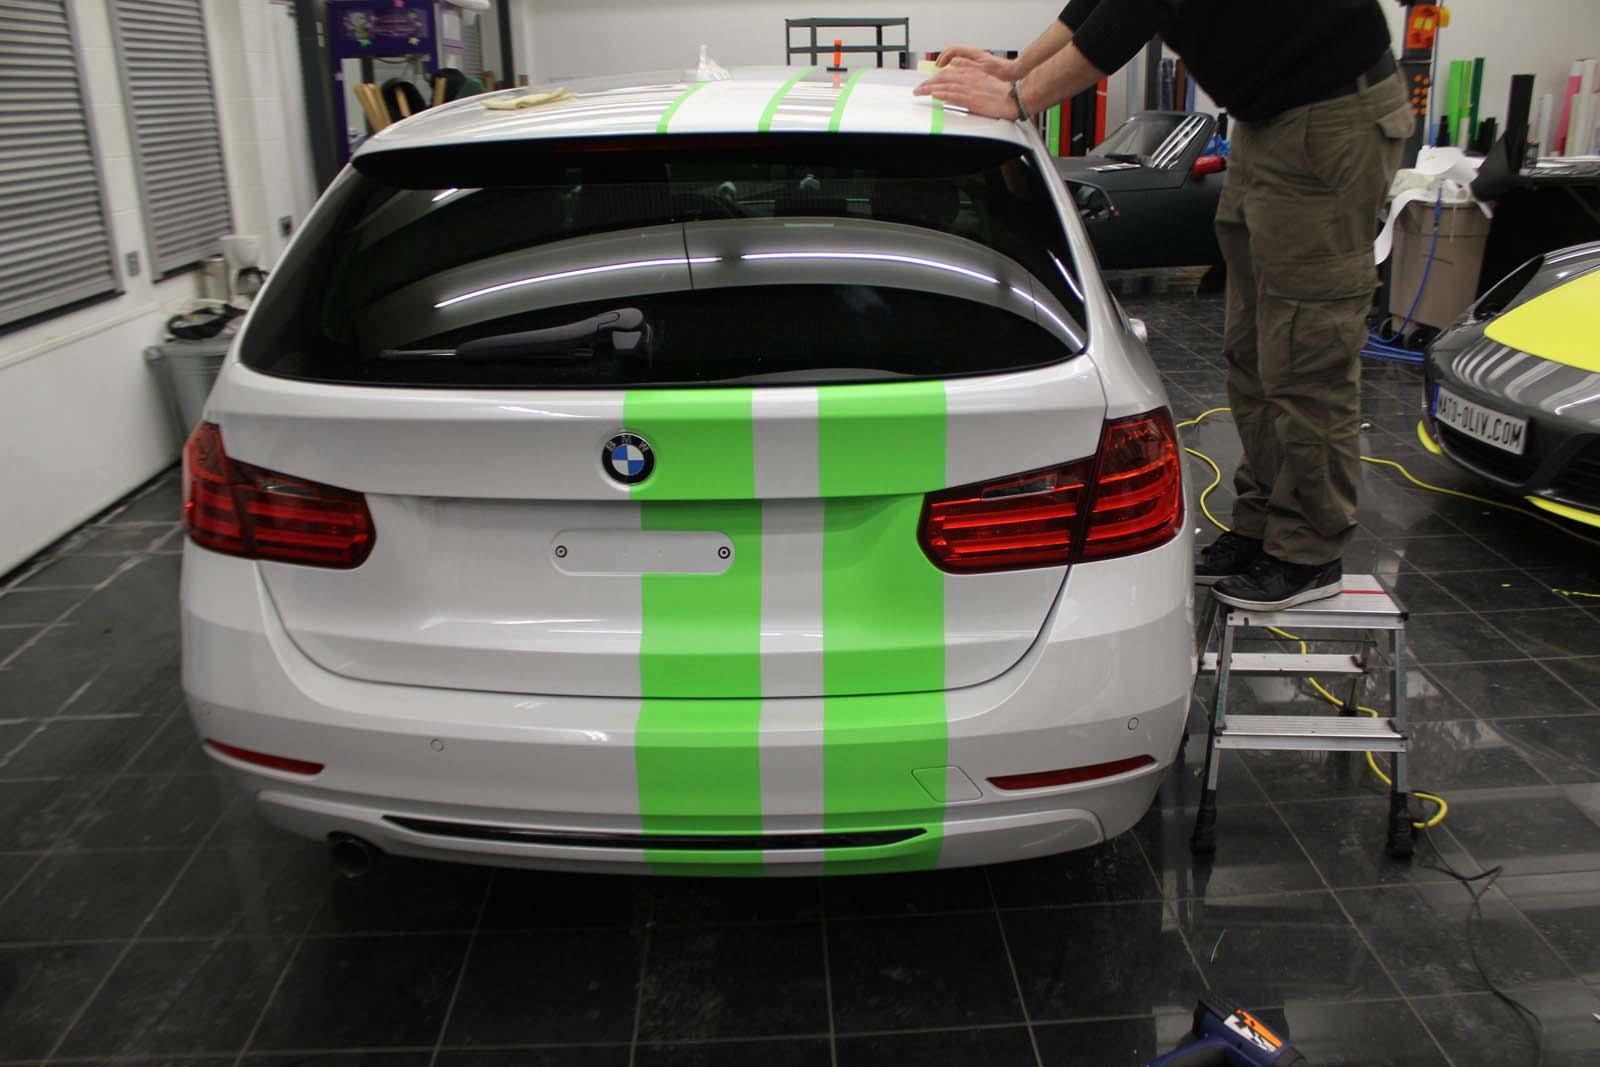 BMW_3ER_RALLYESTREIFEN_WEISS_GRUEN_MATT_MIT_BRANDING_04